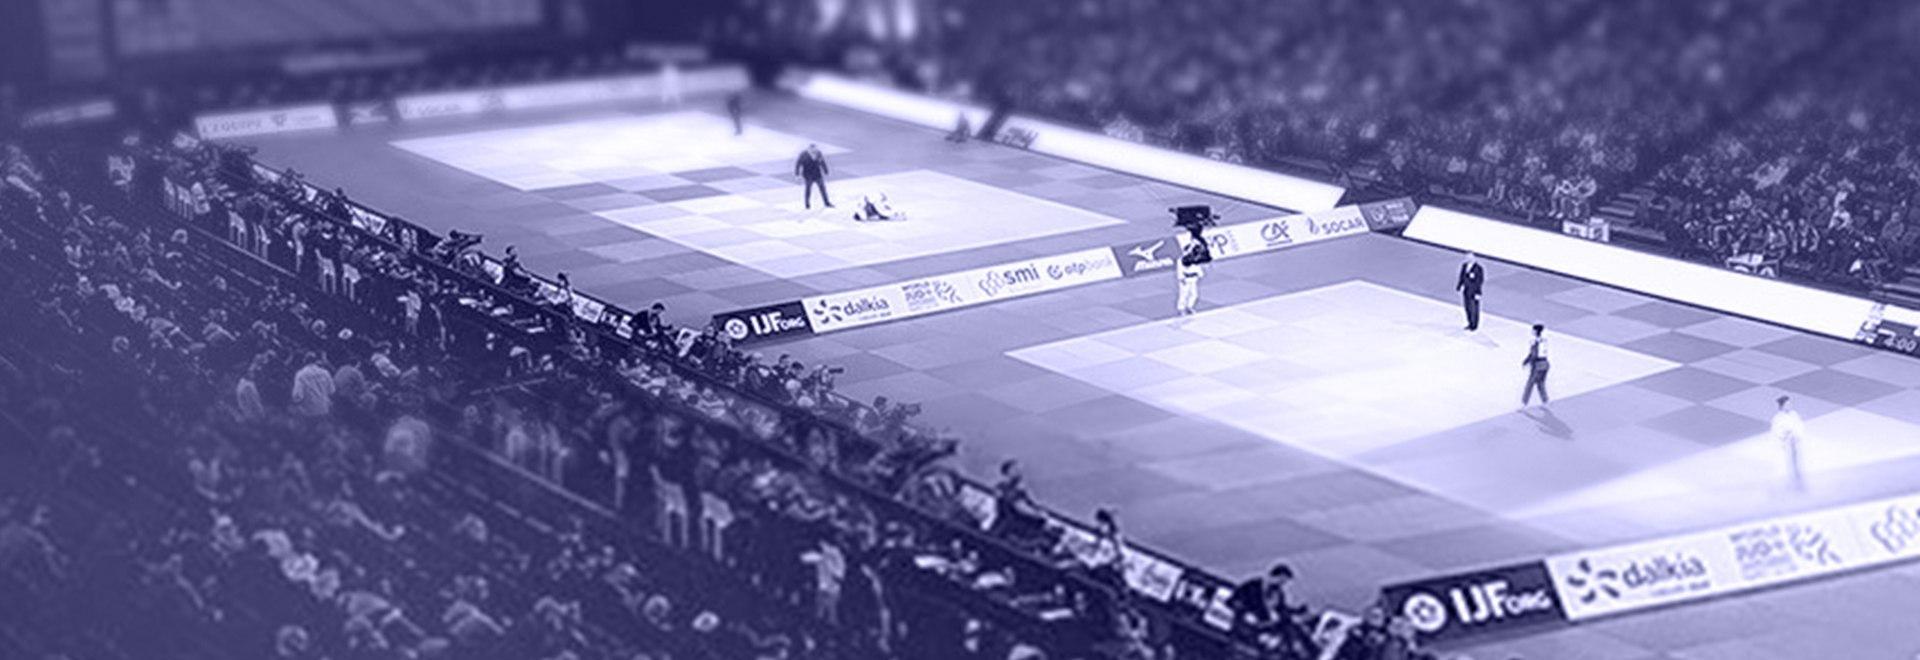 Grand Slam Ekaterinburg